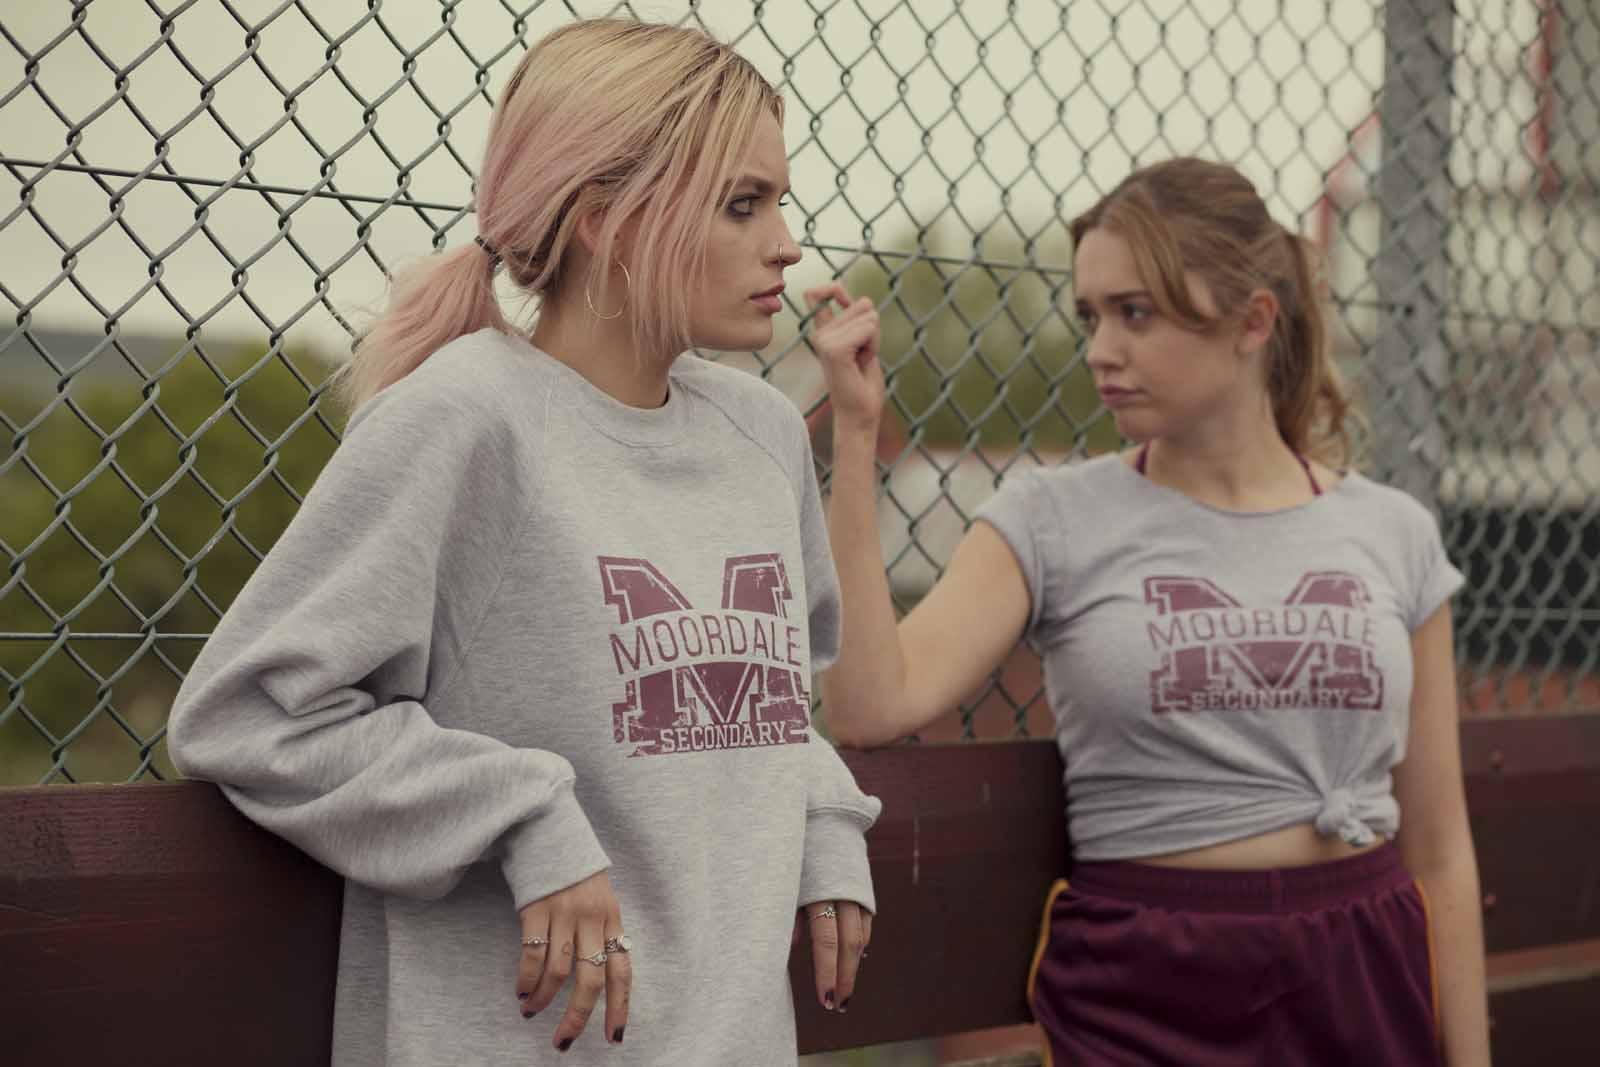 Emma Mackey (Maeve Wiley) & Aimee Lou Wood (Aimée Gibbs) |Copyright Sam Taylor/Netflix